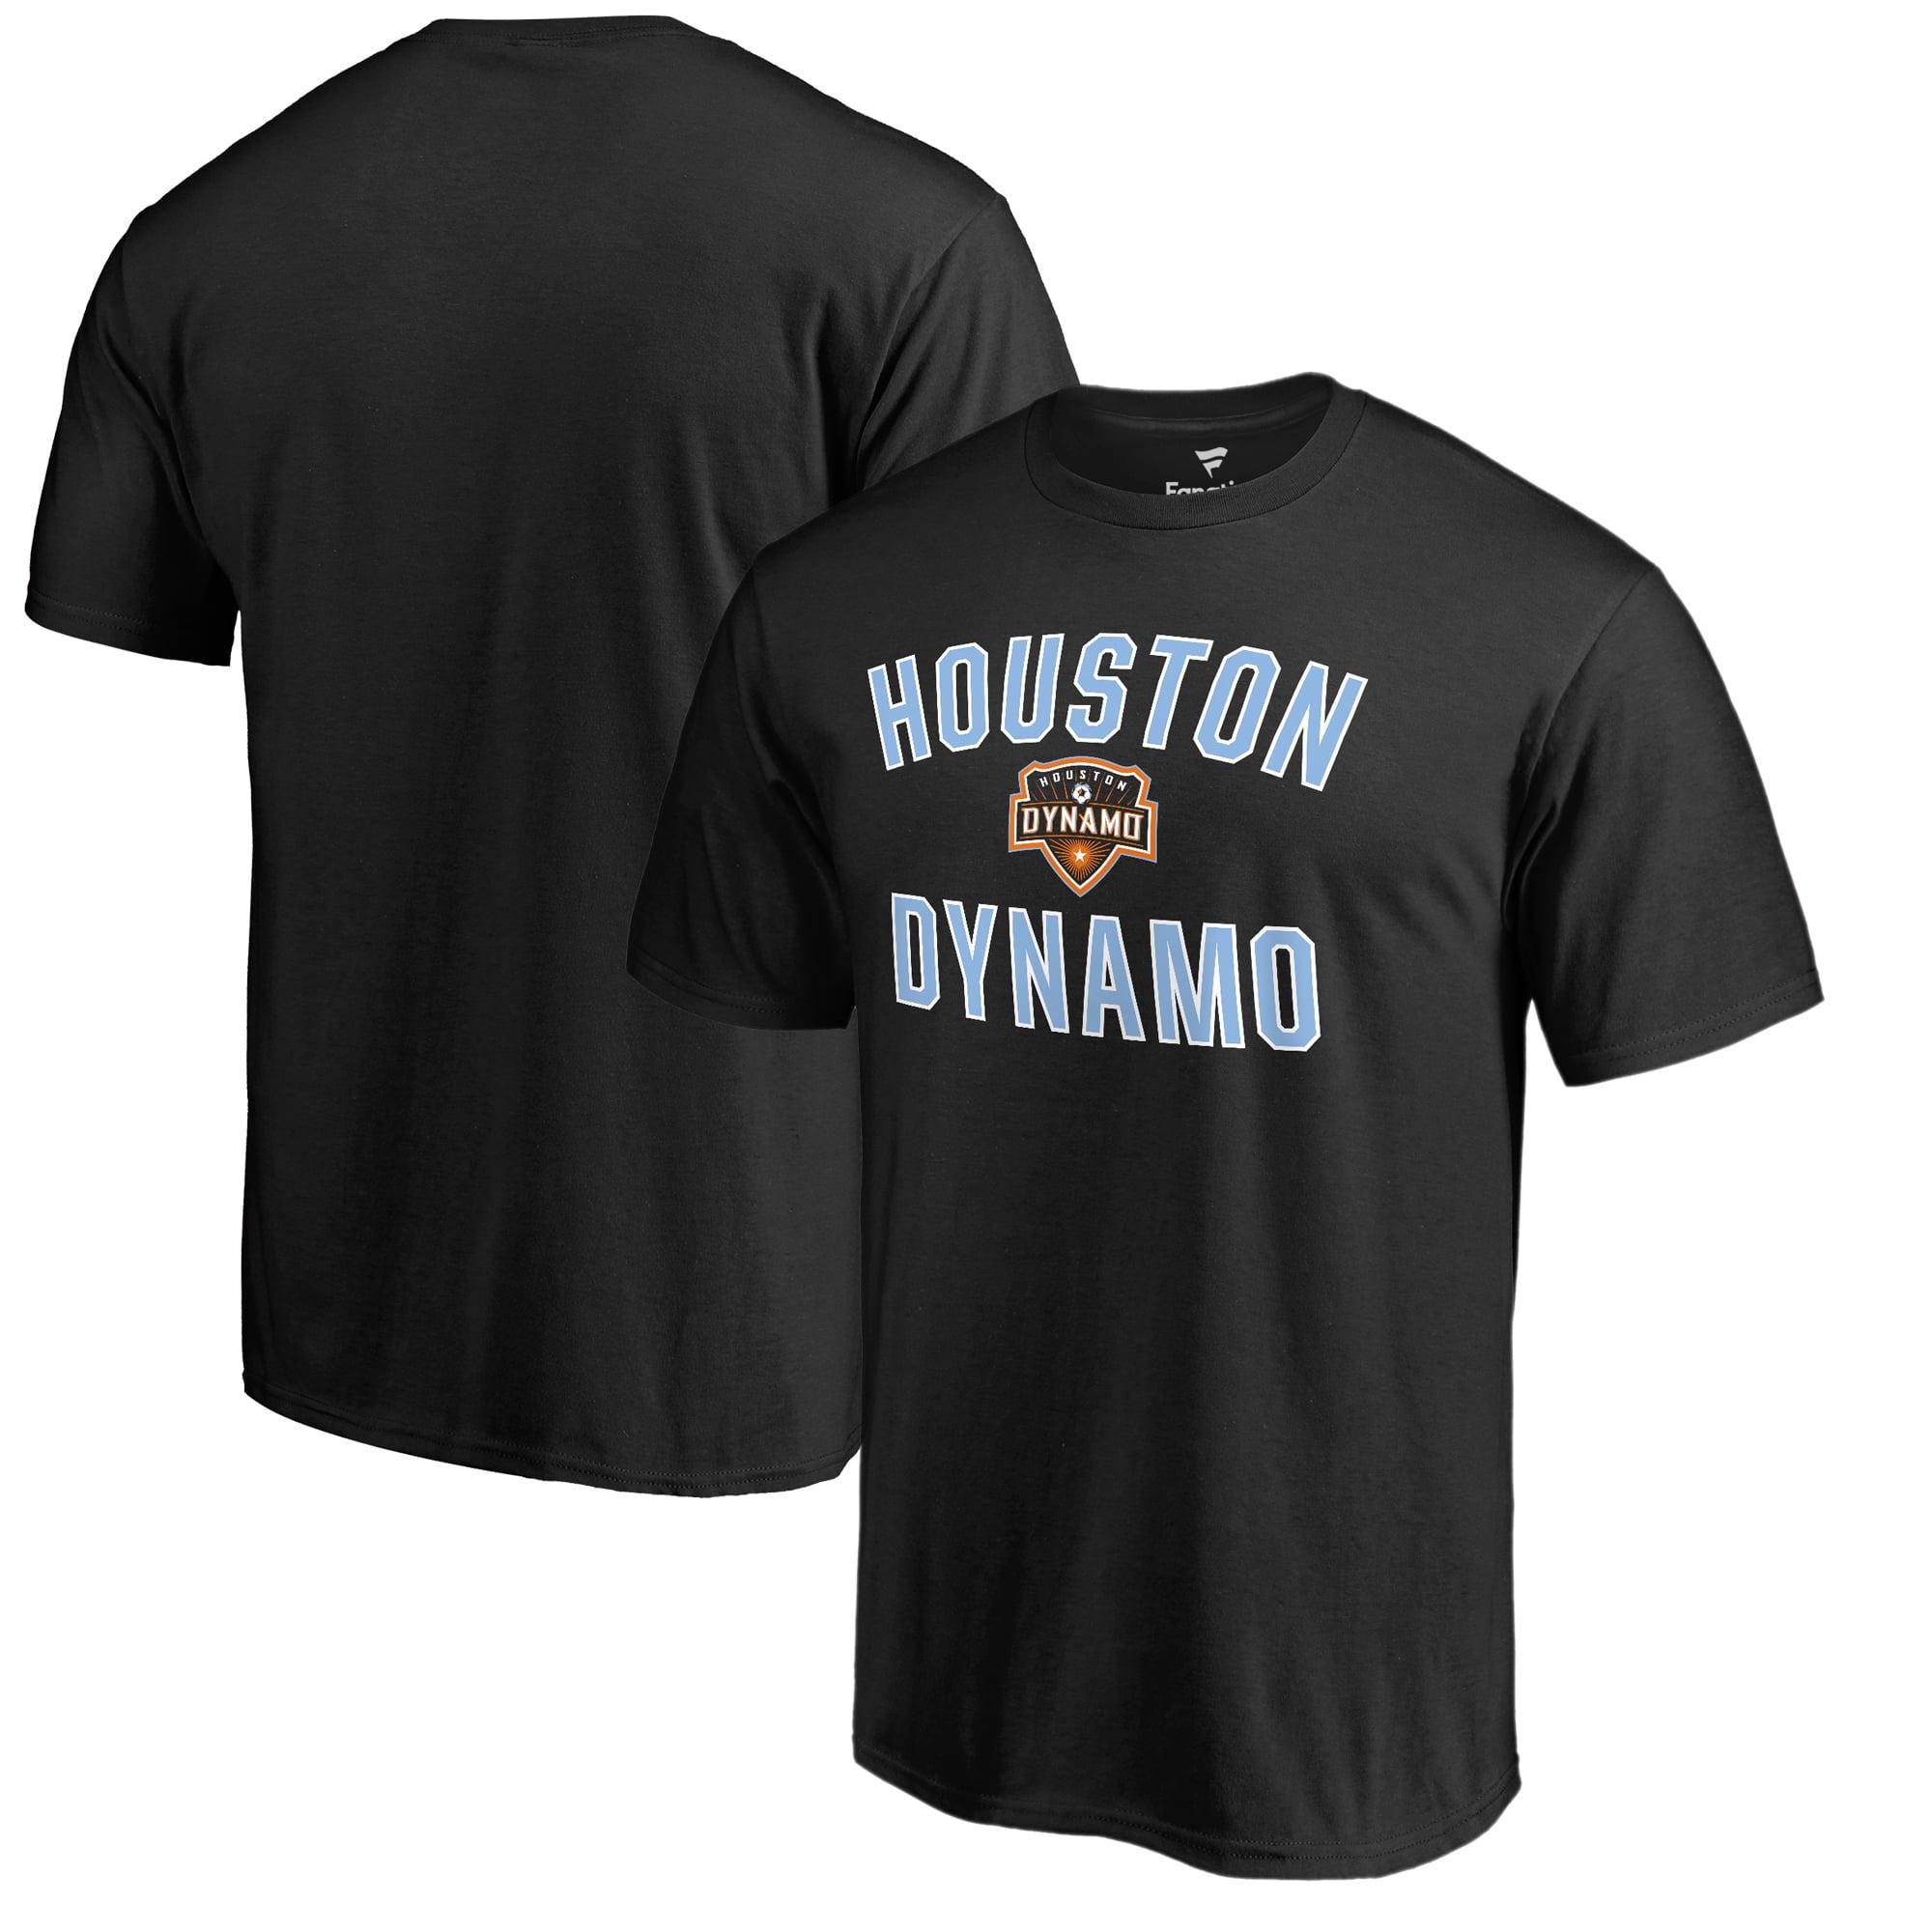 Houston Dynamo Fanatics Branded Victory Arch T-Shirt - Black